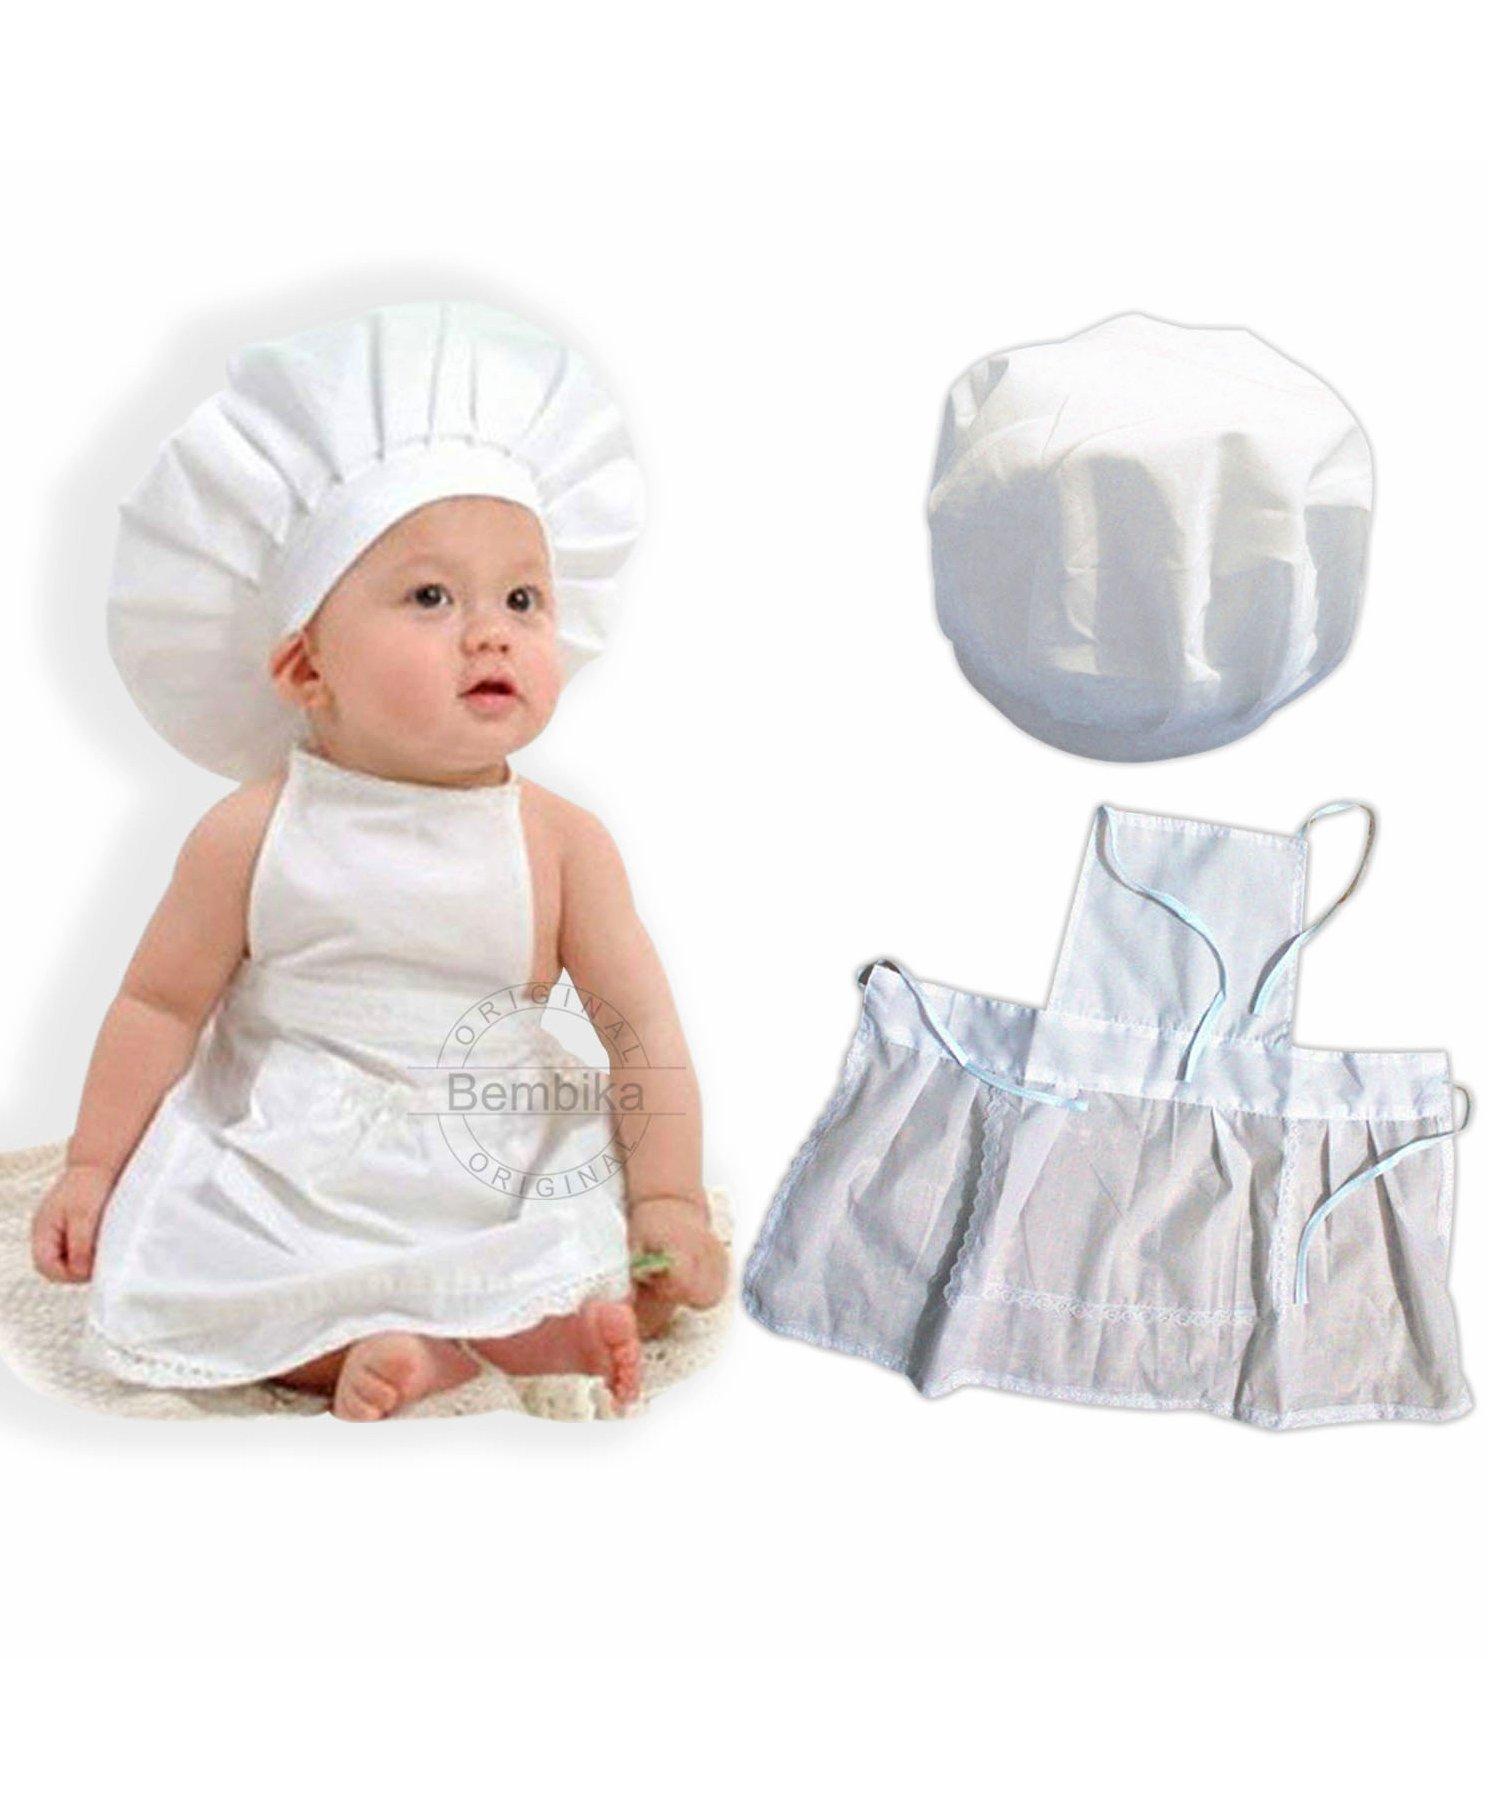 5af991894a4 Bembika Newborn Master chef Costume Photography Prop Set White ...